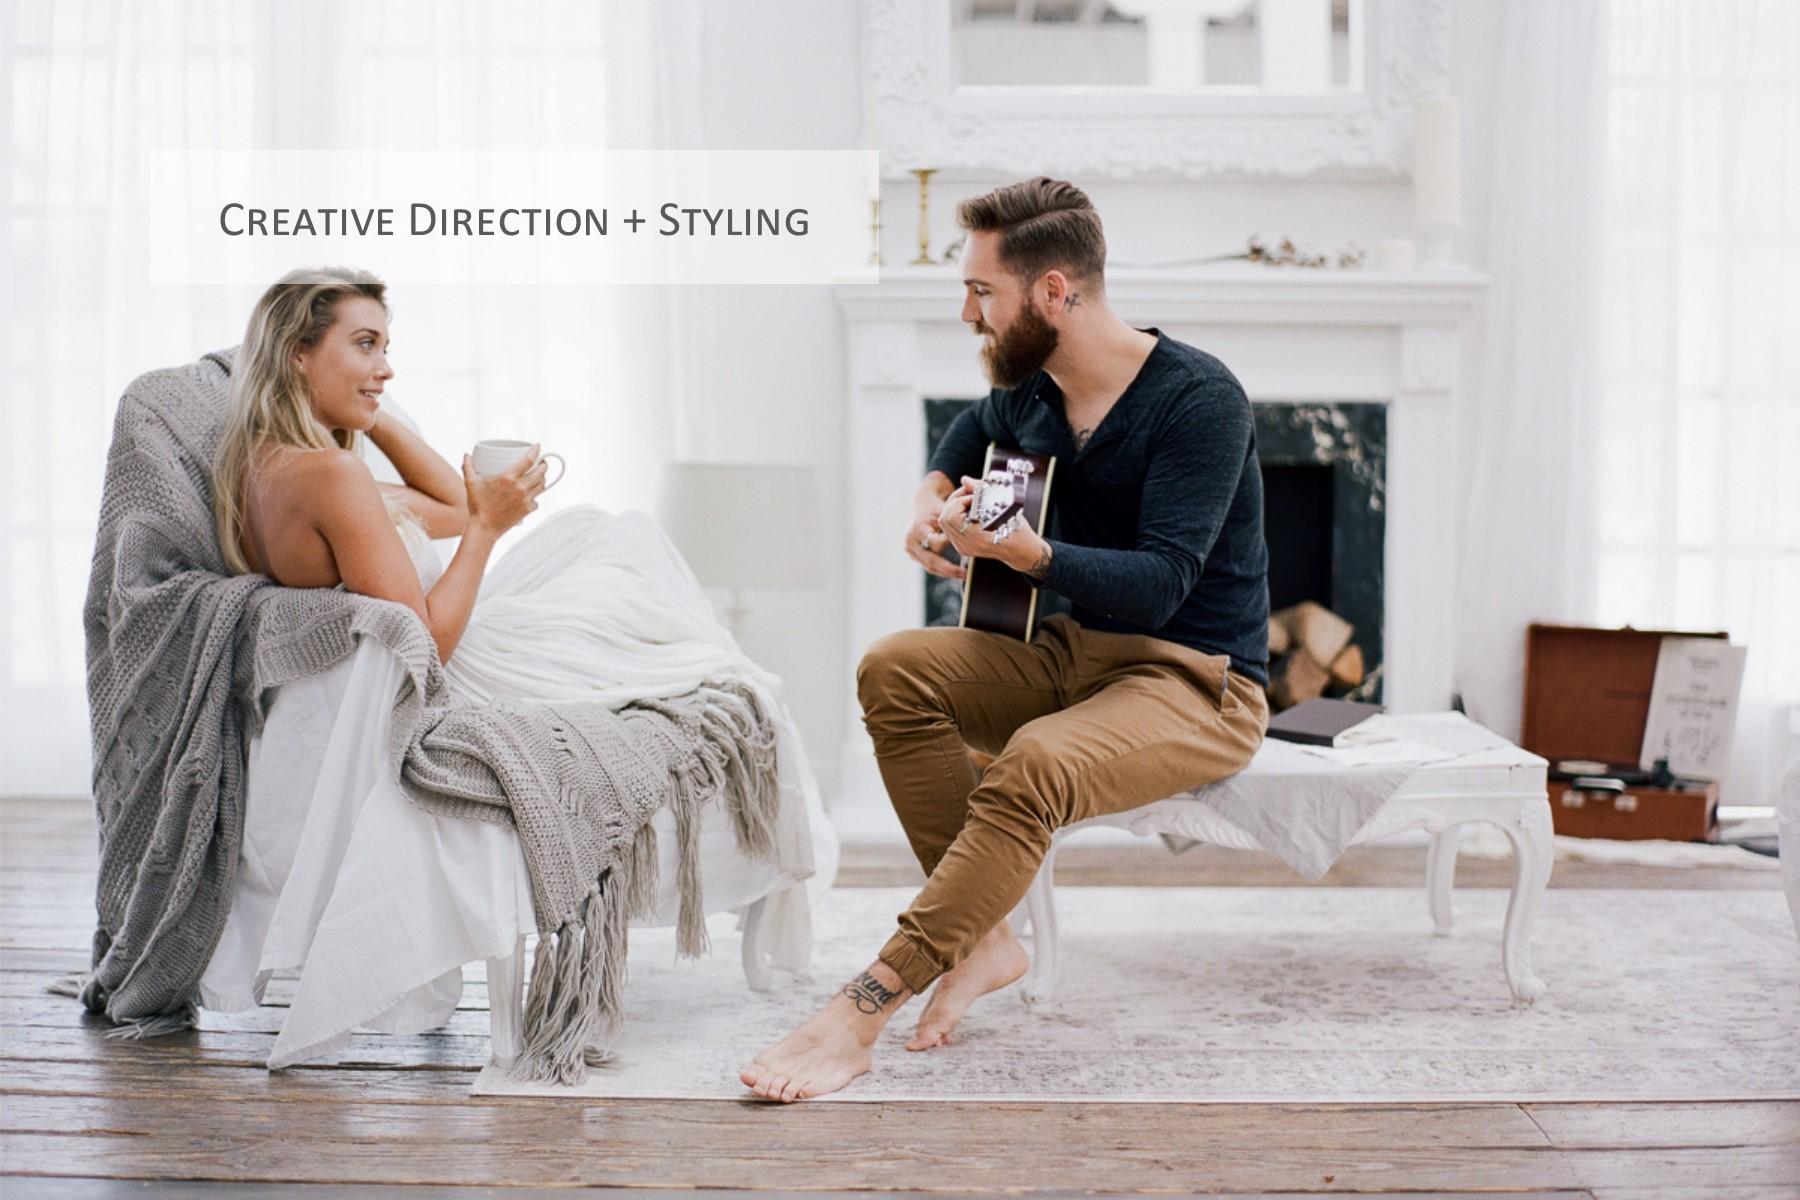 Creative Direction + Styling Website Graphic jpg.jpg